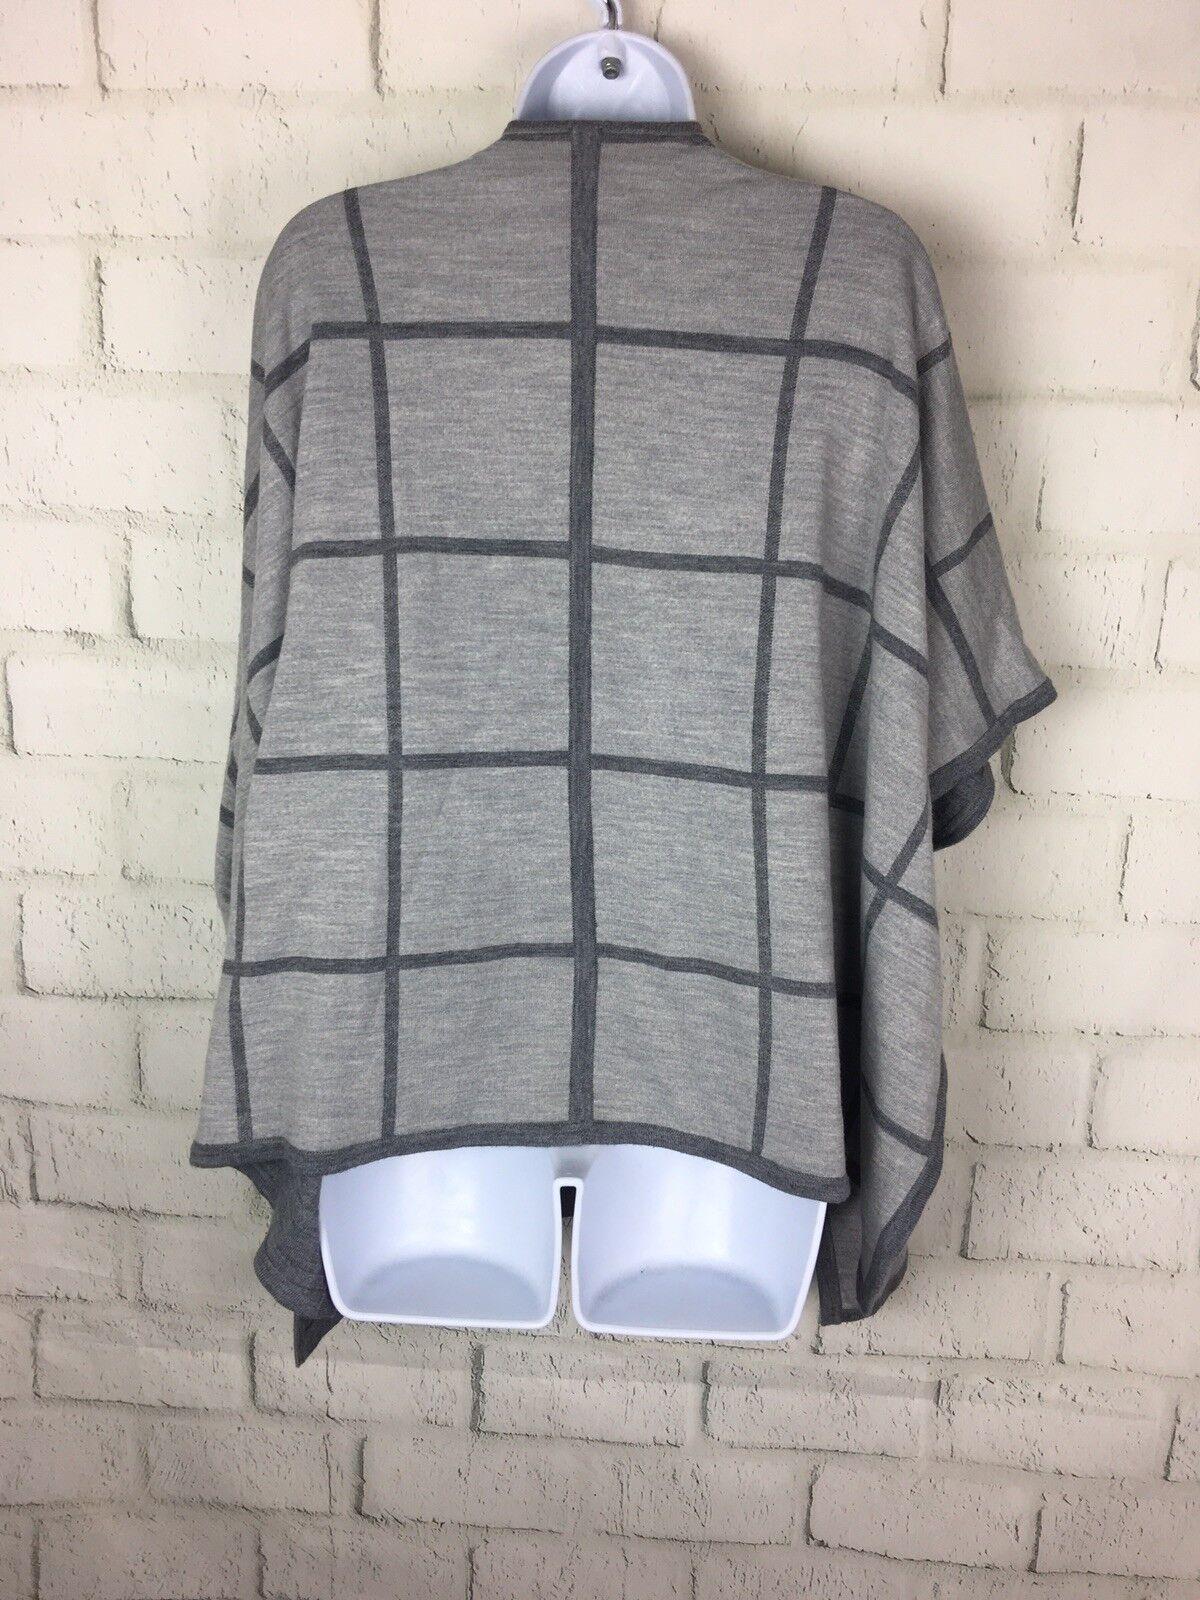 ATHLETA ATHLETA ATHLETA  178 Dakota Grey Windowpane Plaid Reversible Poncho Cape Sweater One Sz e22c32